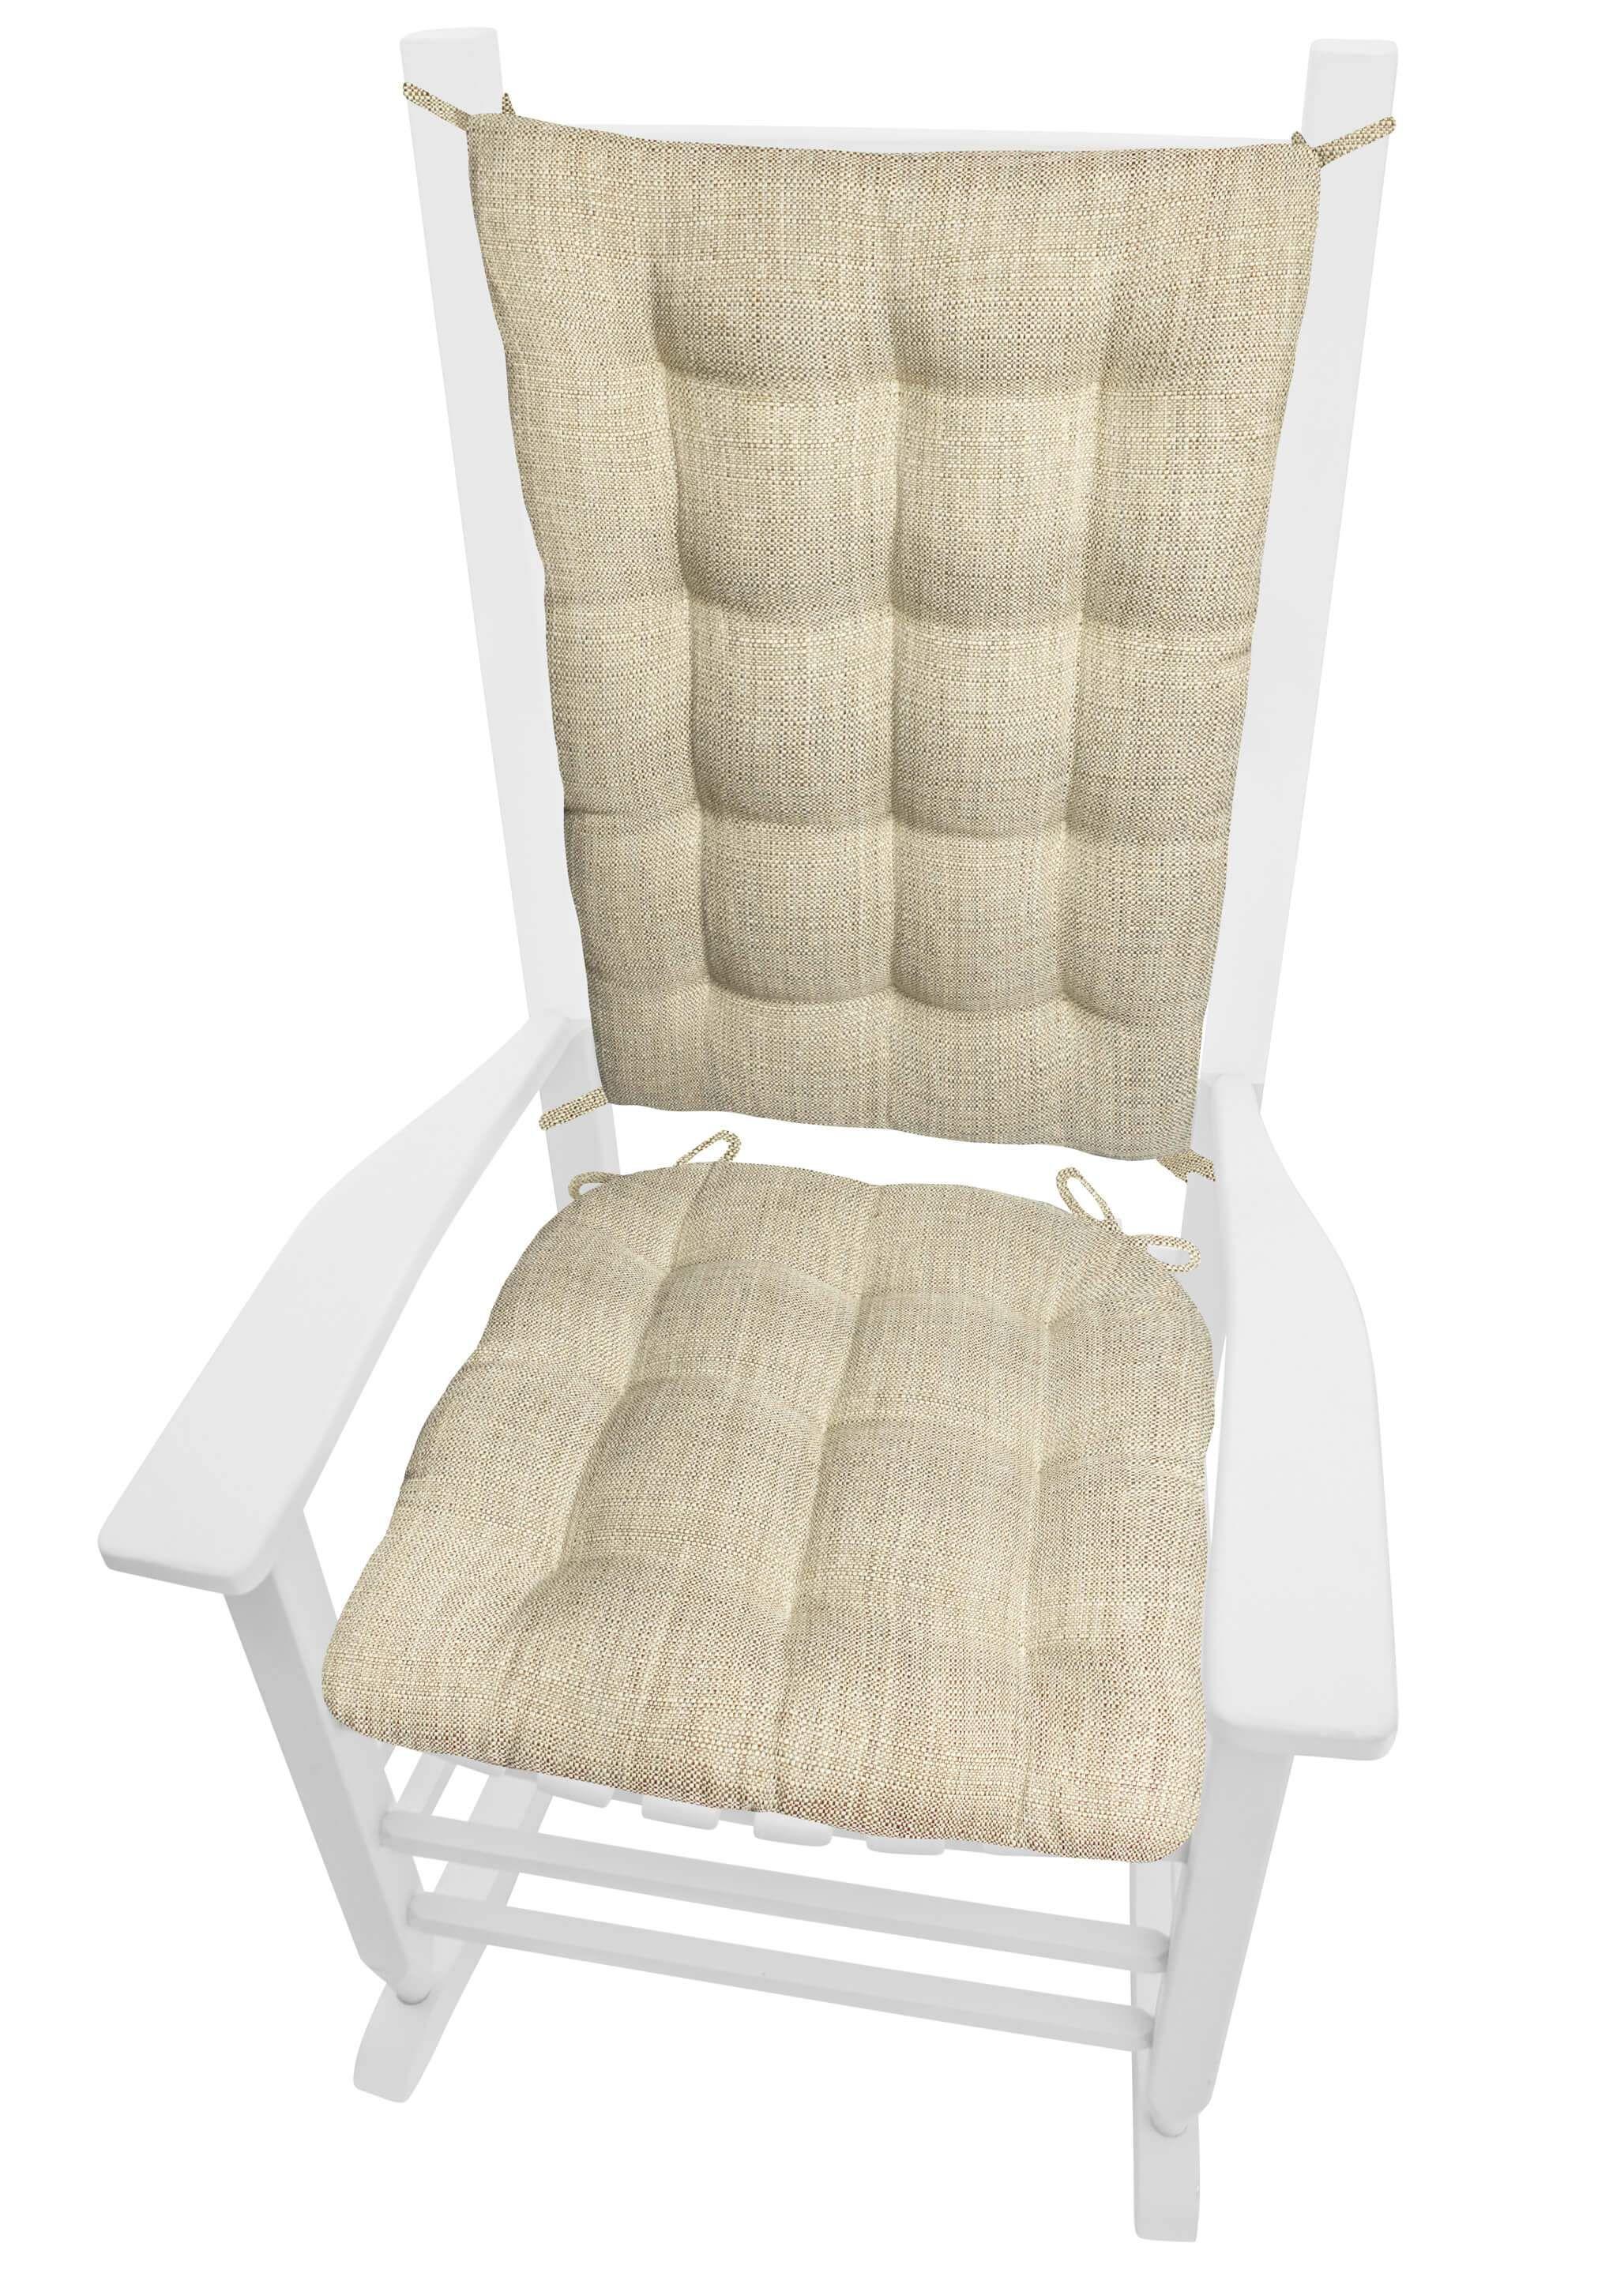 Excellent Handsome Natural Tweed Rocking Chair Cushion Latex Foam Uwap Interior Chair Design Uwaporg